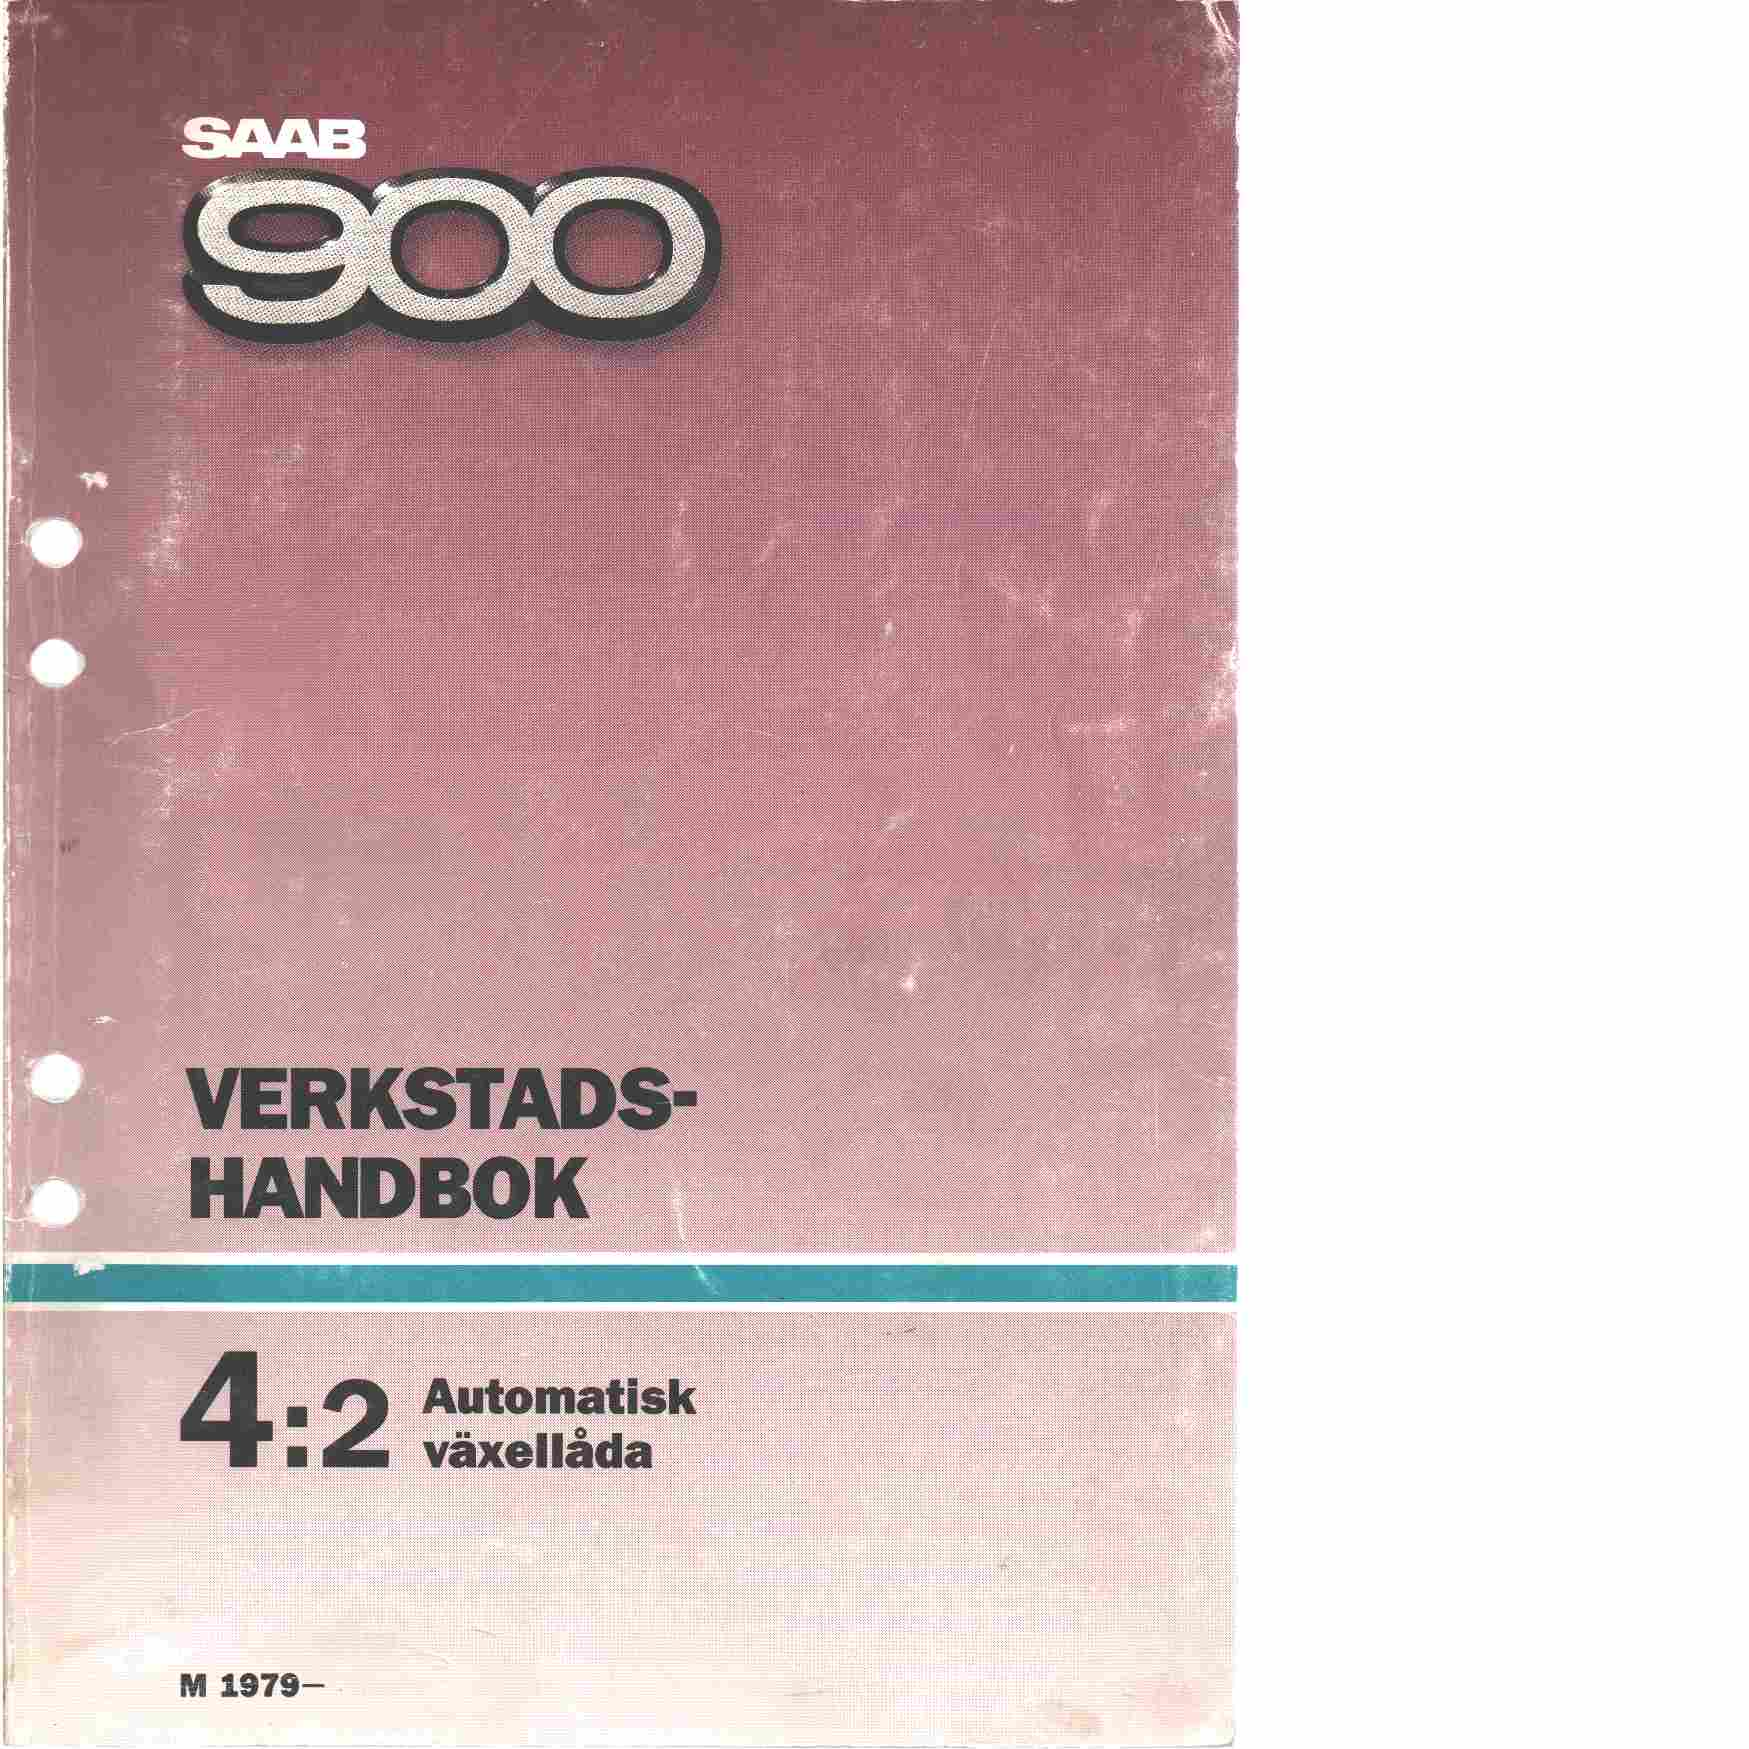 Saab 900 verkstadshandbok 4:2 automatisk växellåda 1979 - 1985 - Red.